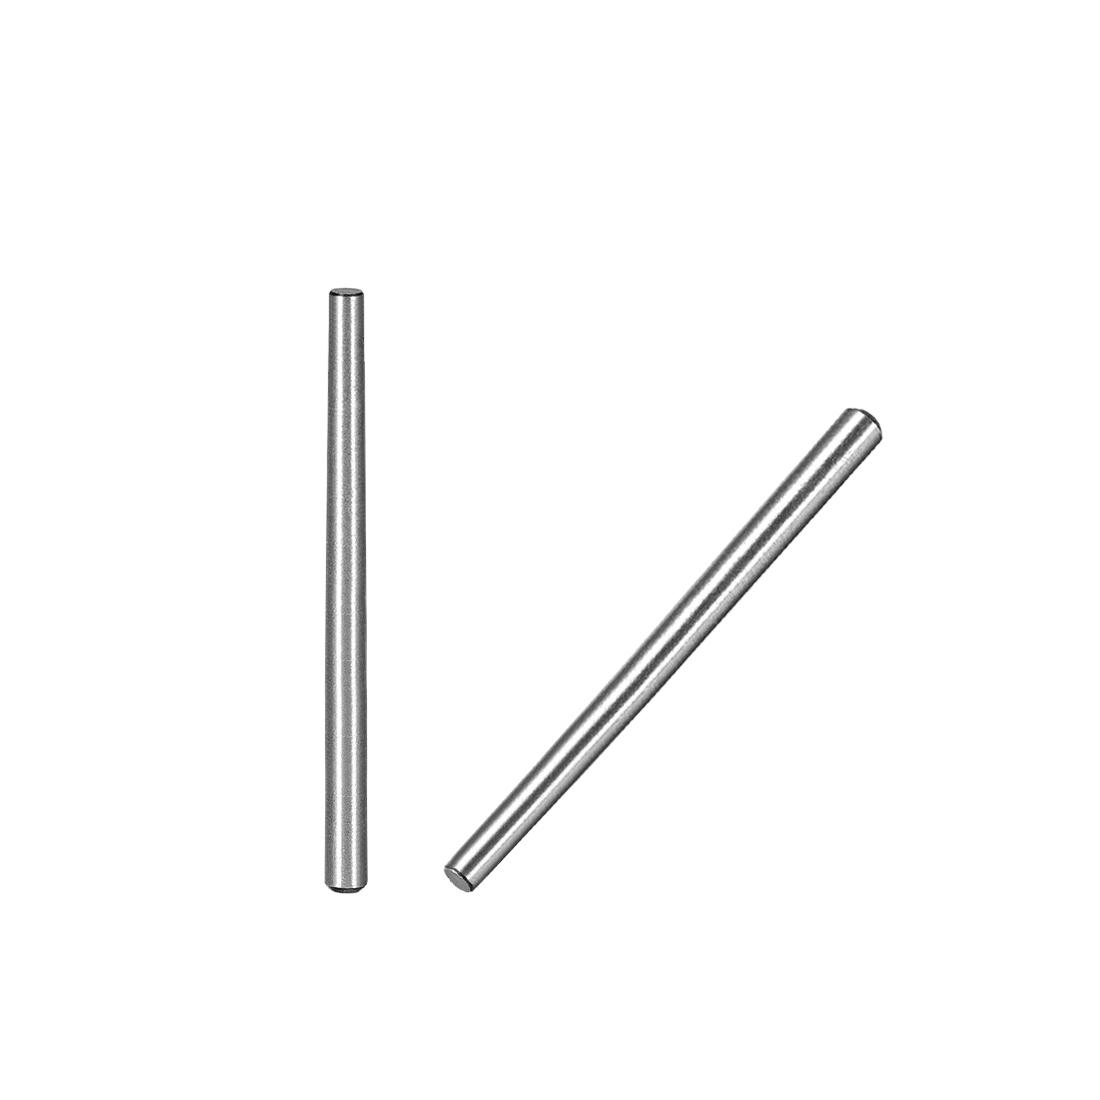 45# Carbon Steel GB117 60mm Length 3mm Small End Diameter 1:50 Taper Pin 20Pcs